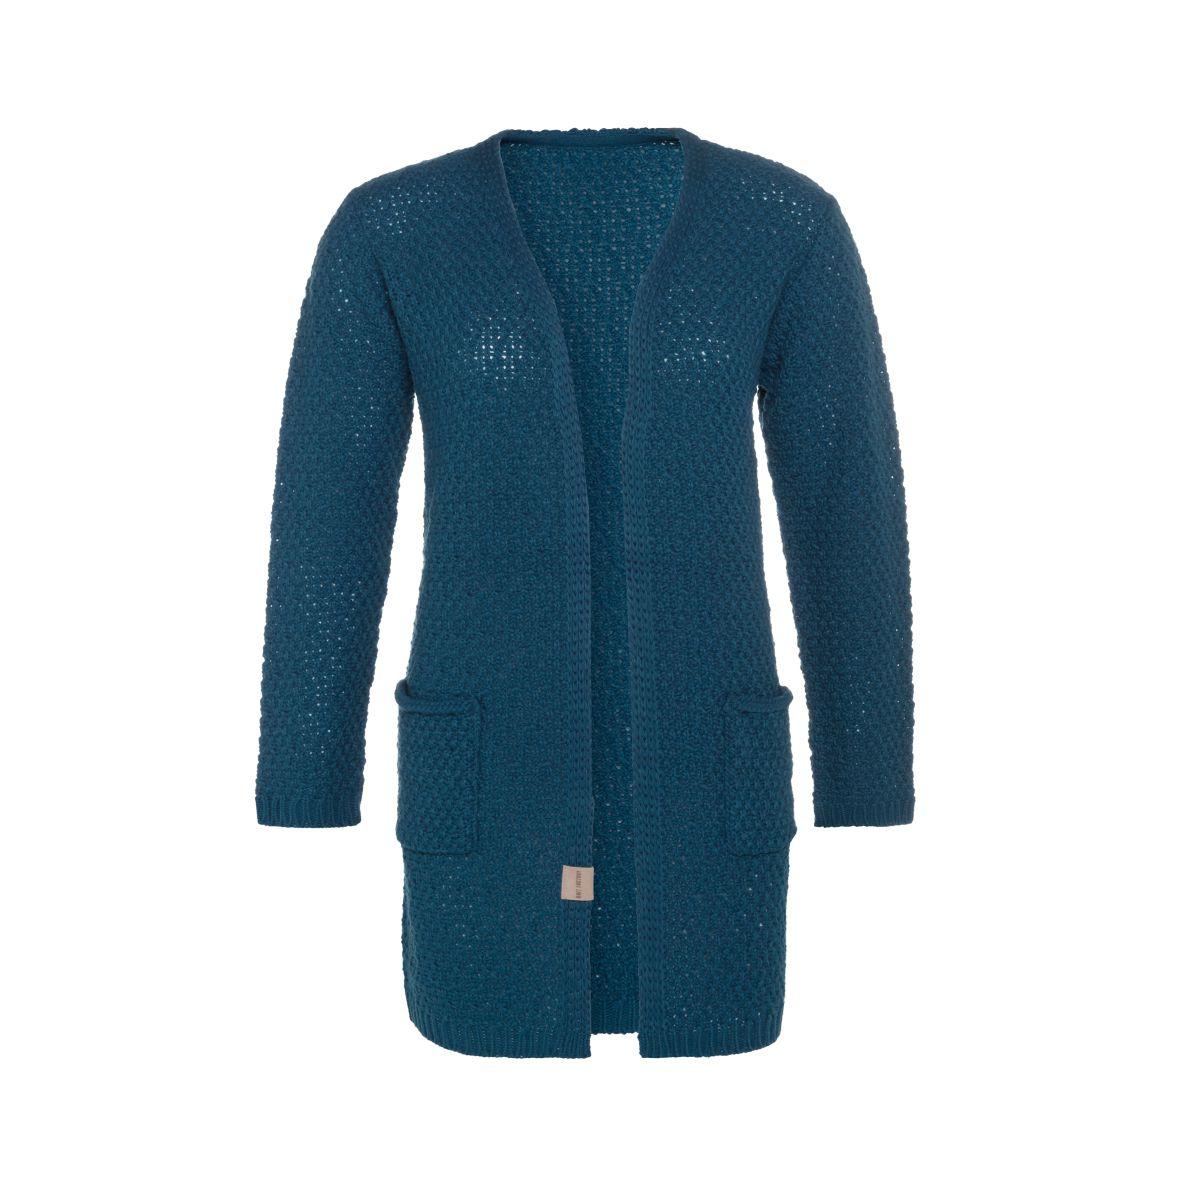 knit factory kf13308100851 luna vest petrol 4042 1